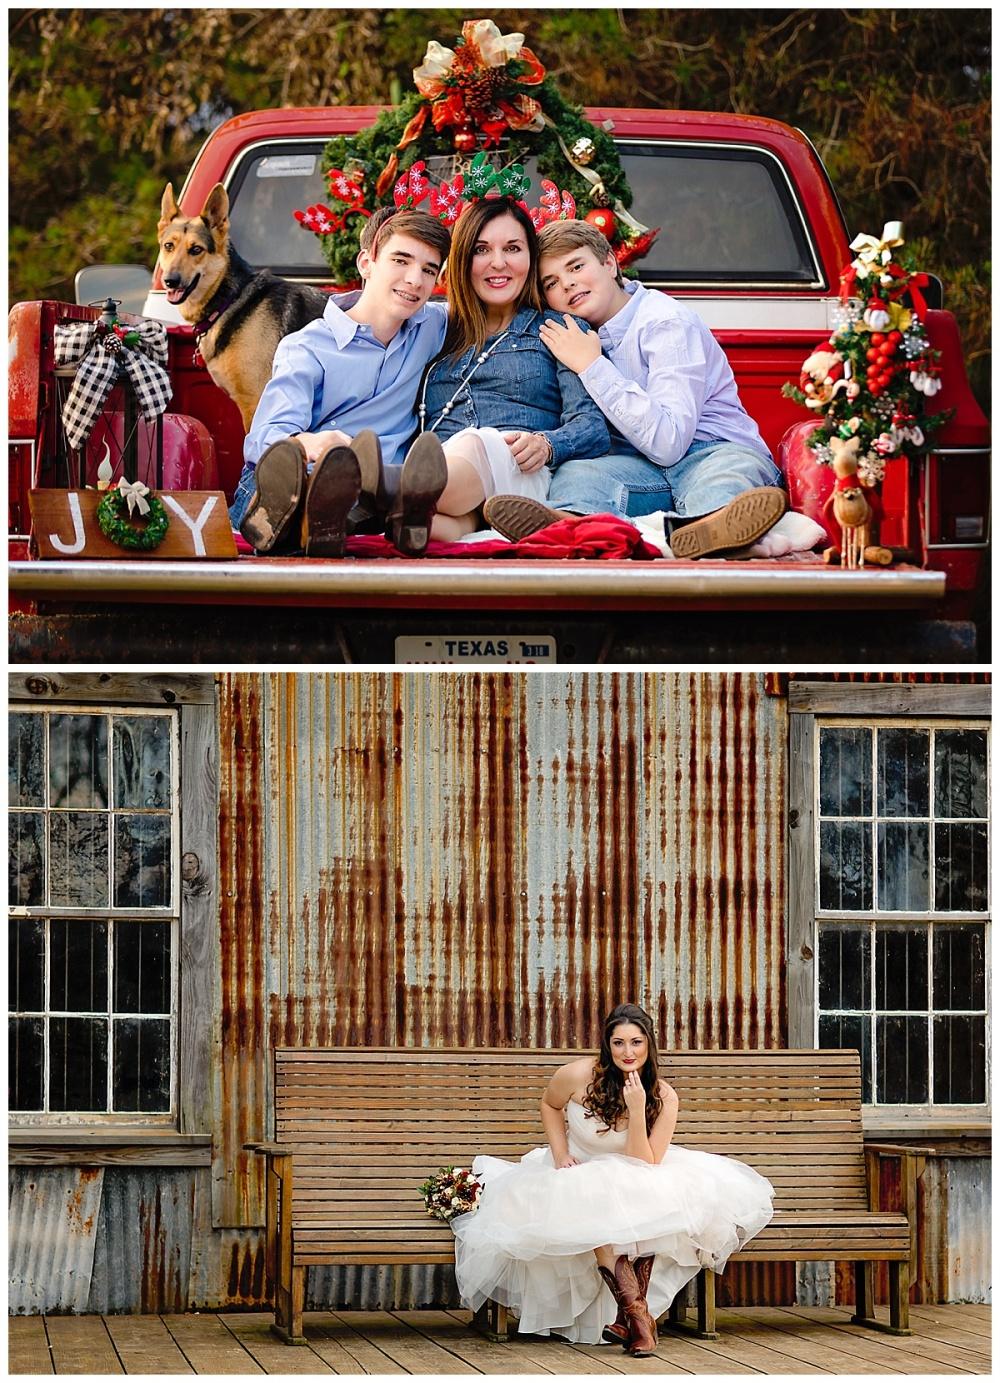 Carly-Barton-Photography-San-Antonio-Texas-Hill-Country-Fall-Heubaum_0161